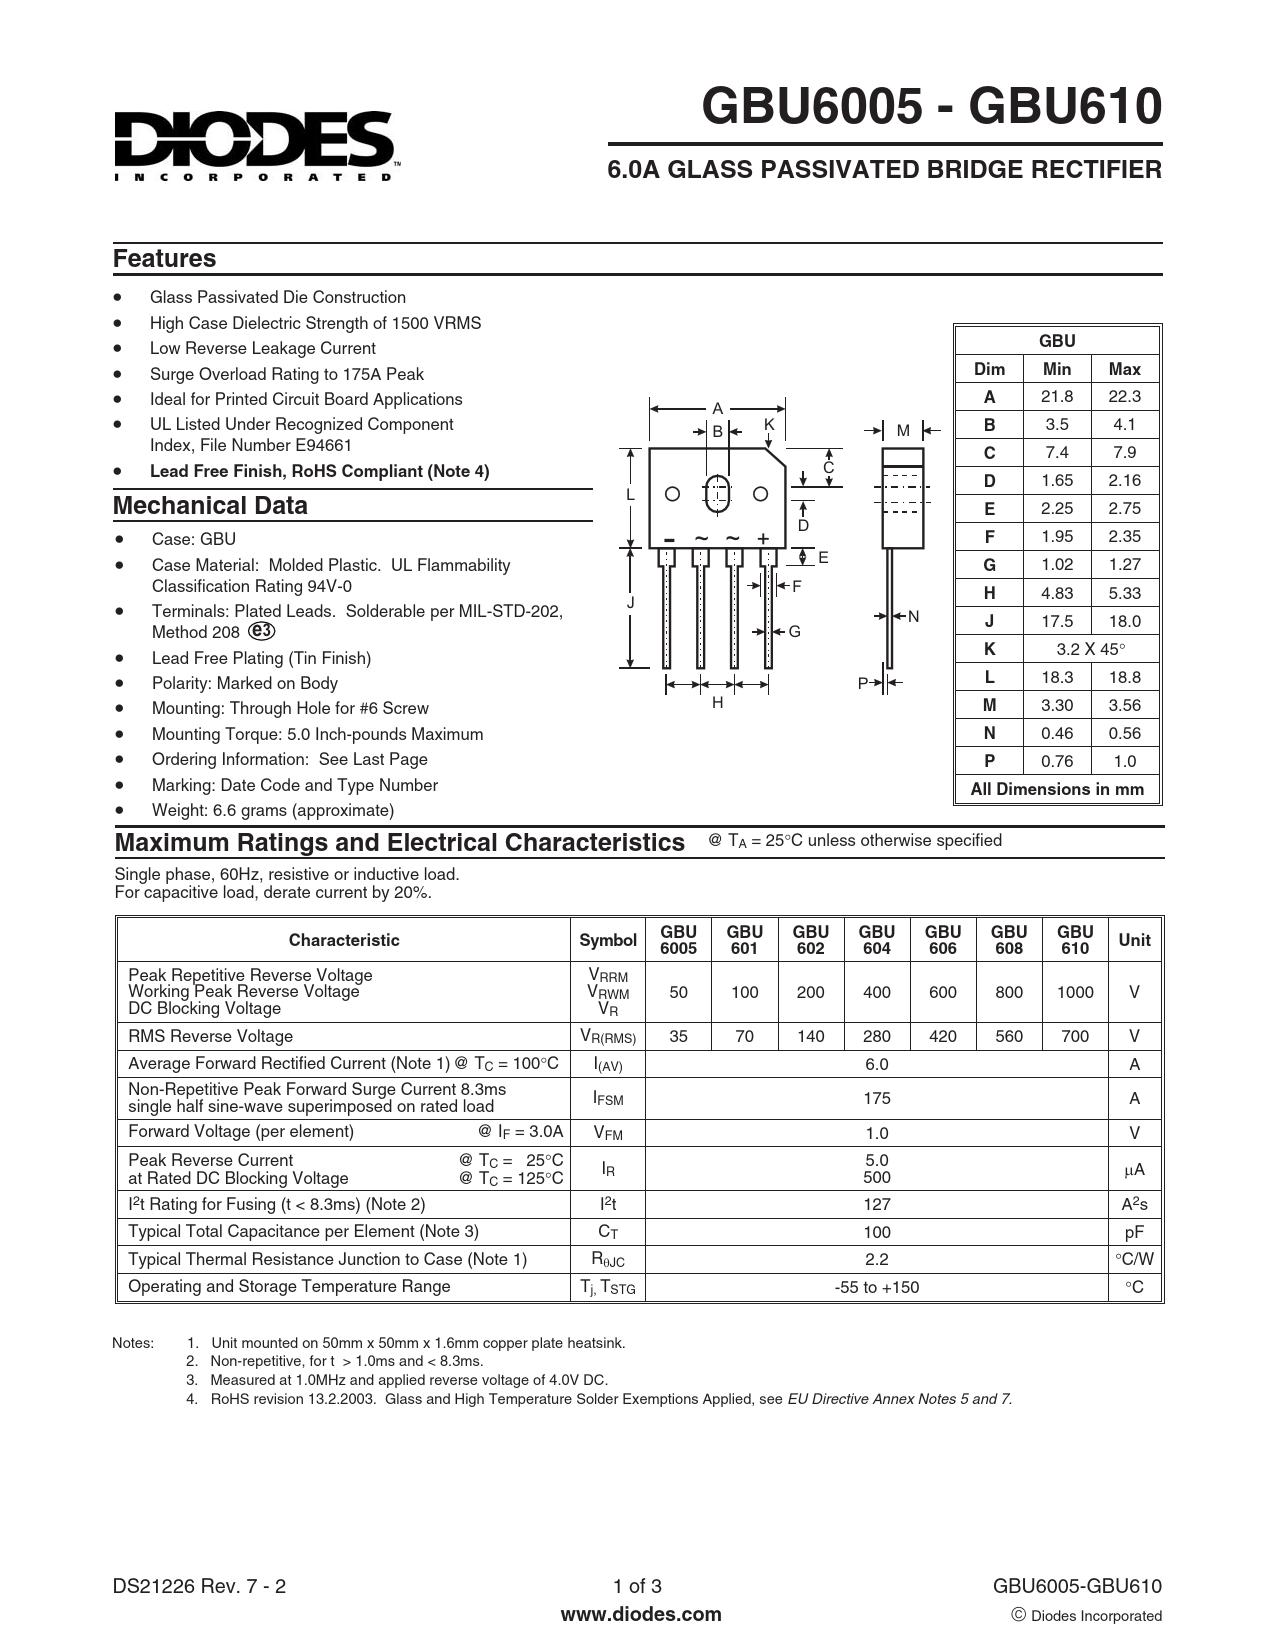 Datasheet GBU6005, GBU601, GBU602, GBU604, GBU606, GBU608, GBU610 Diodes